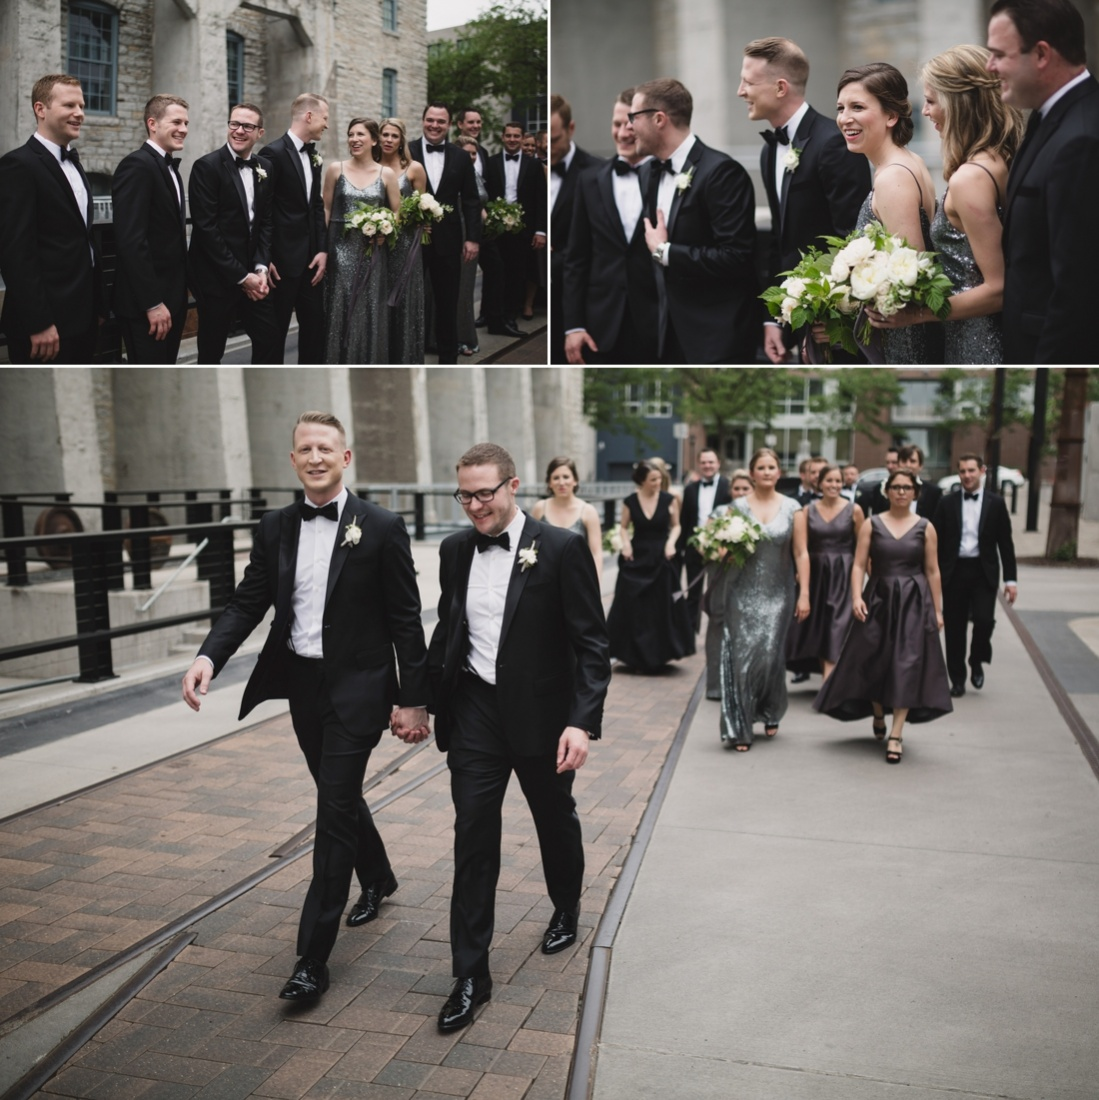 04_Minneapolis_Machine_Shop_Wedding-1099x1100.jpg